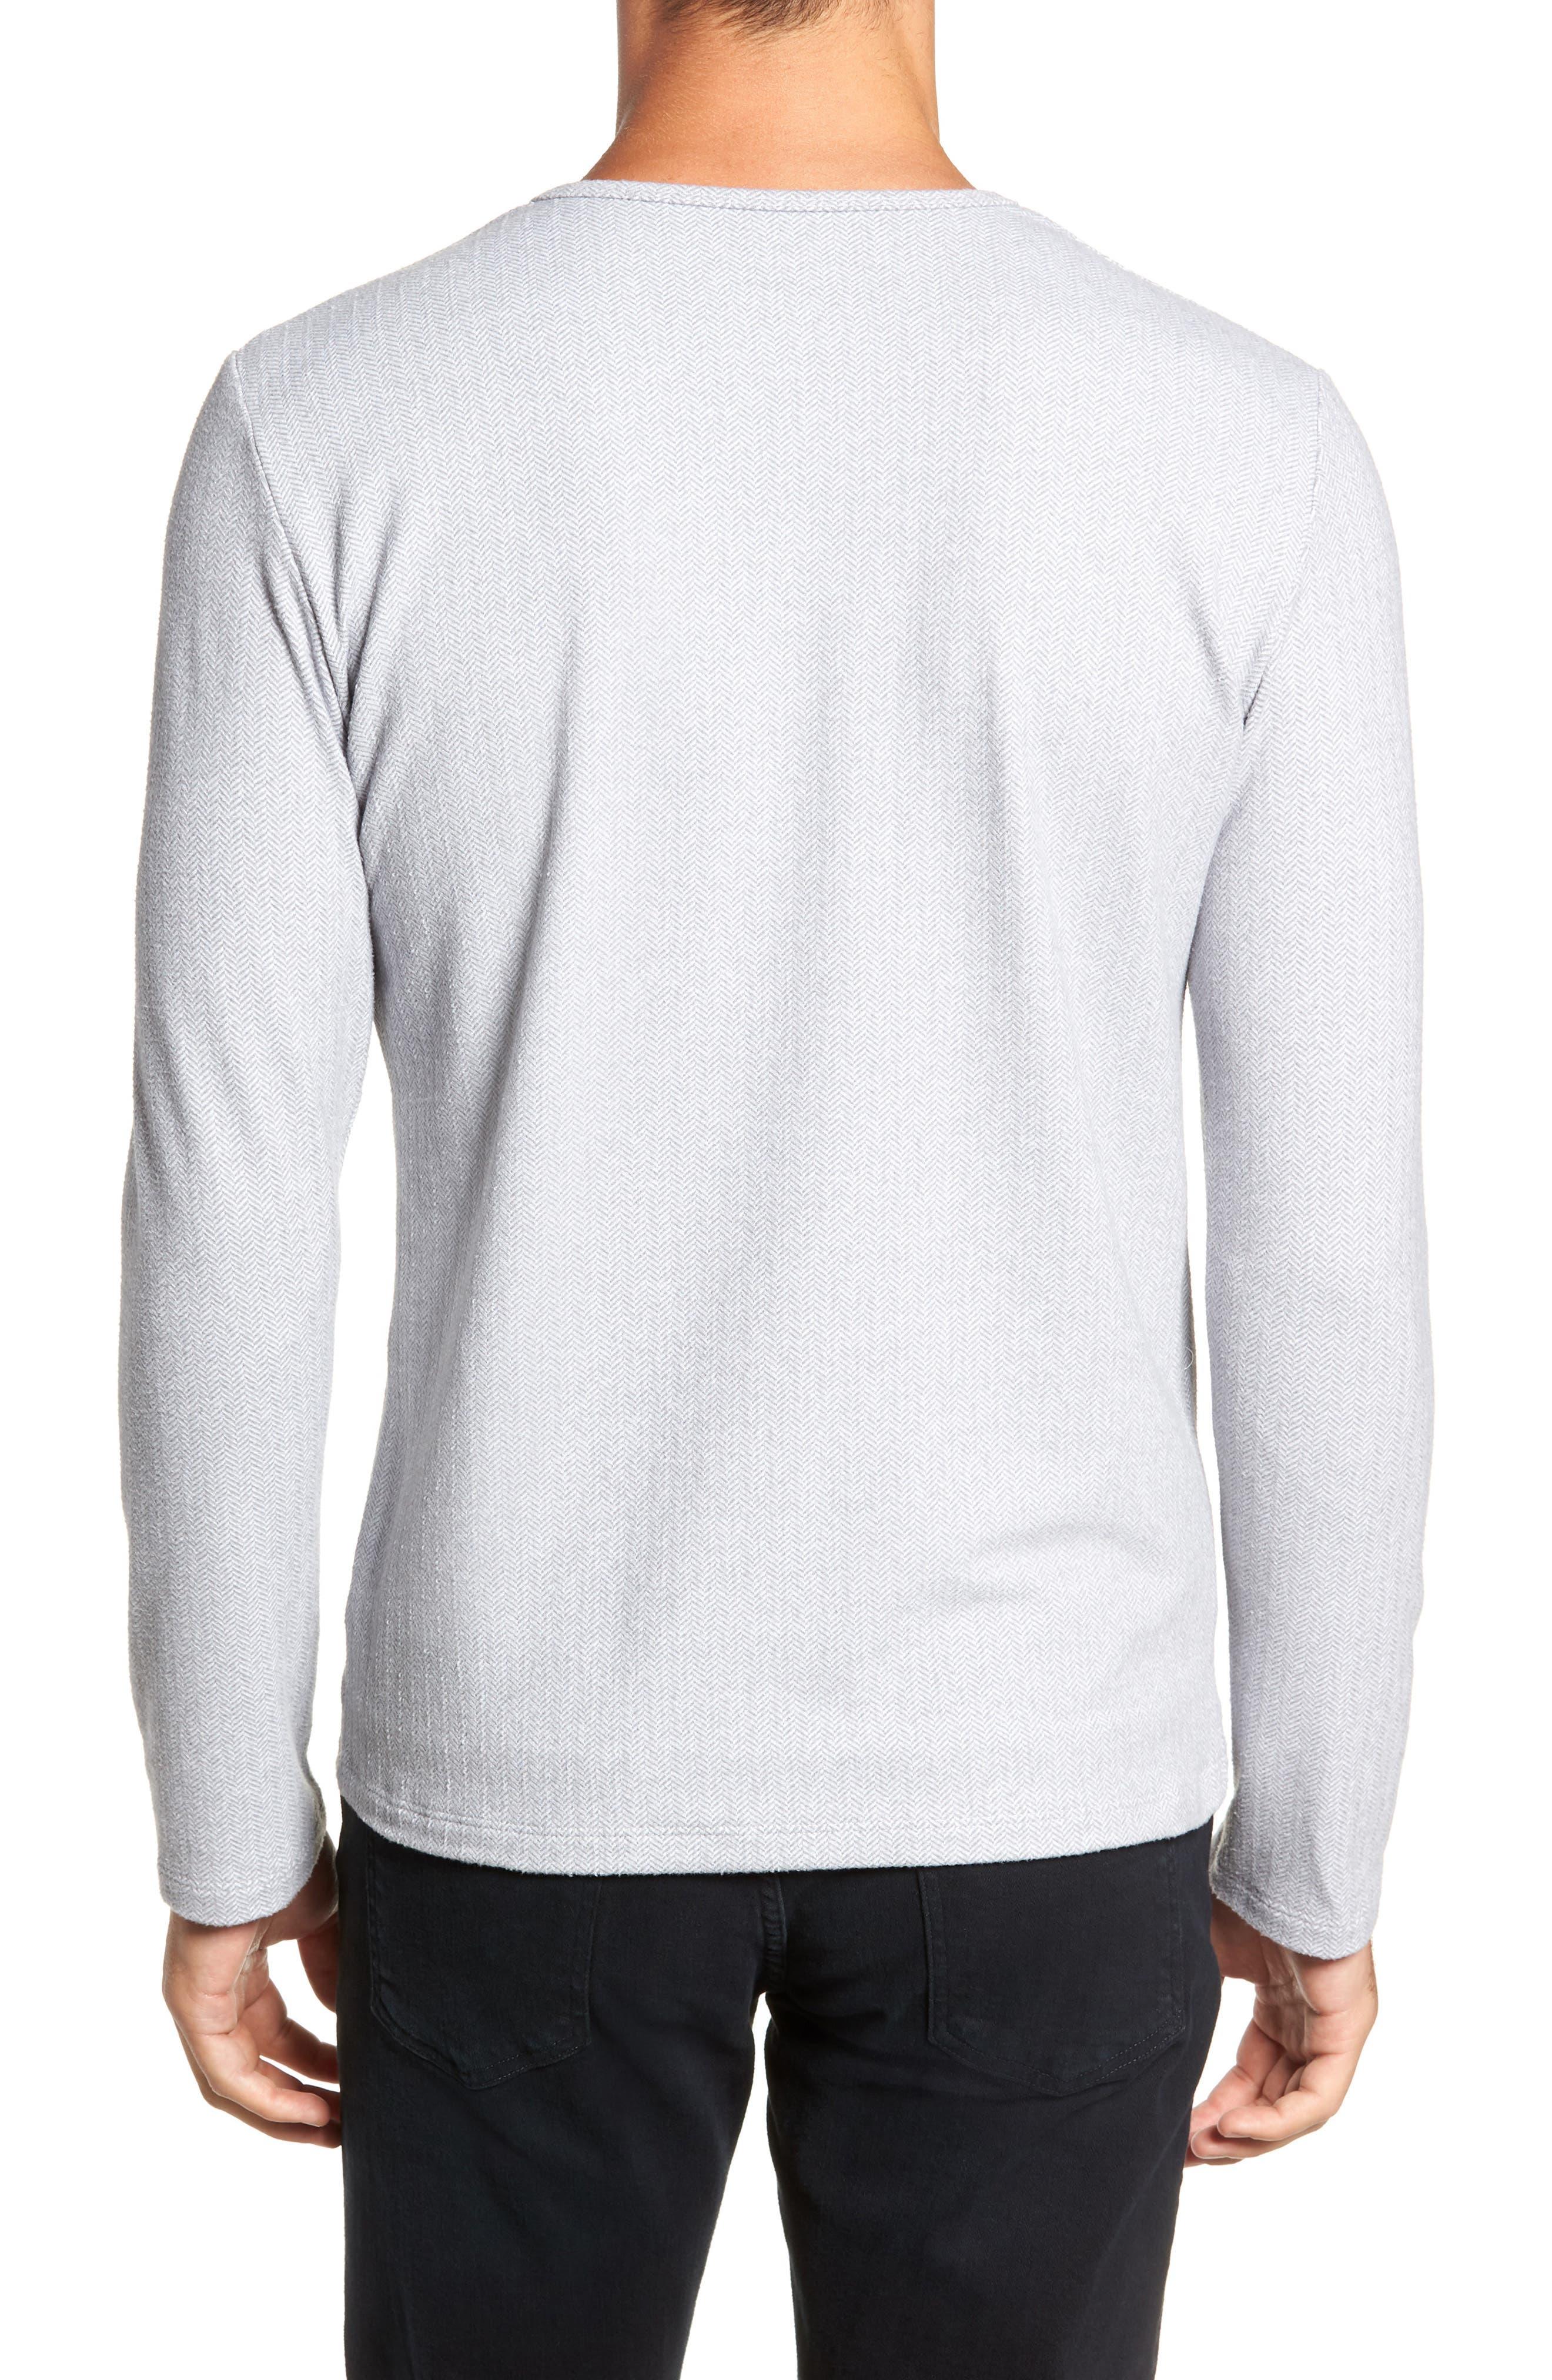 MIZZEN+MAIN,                             Anchorage Regular Fit Henley T-Shirt,                             Alternate thumbnail 2, color,                             031